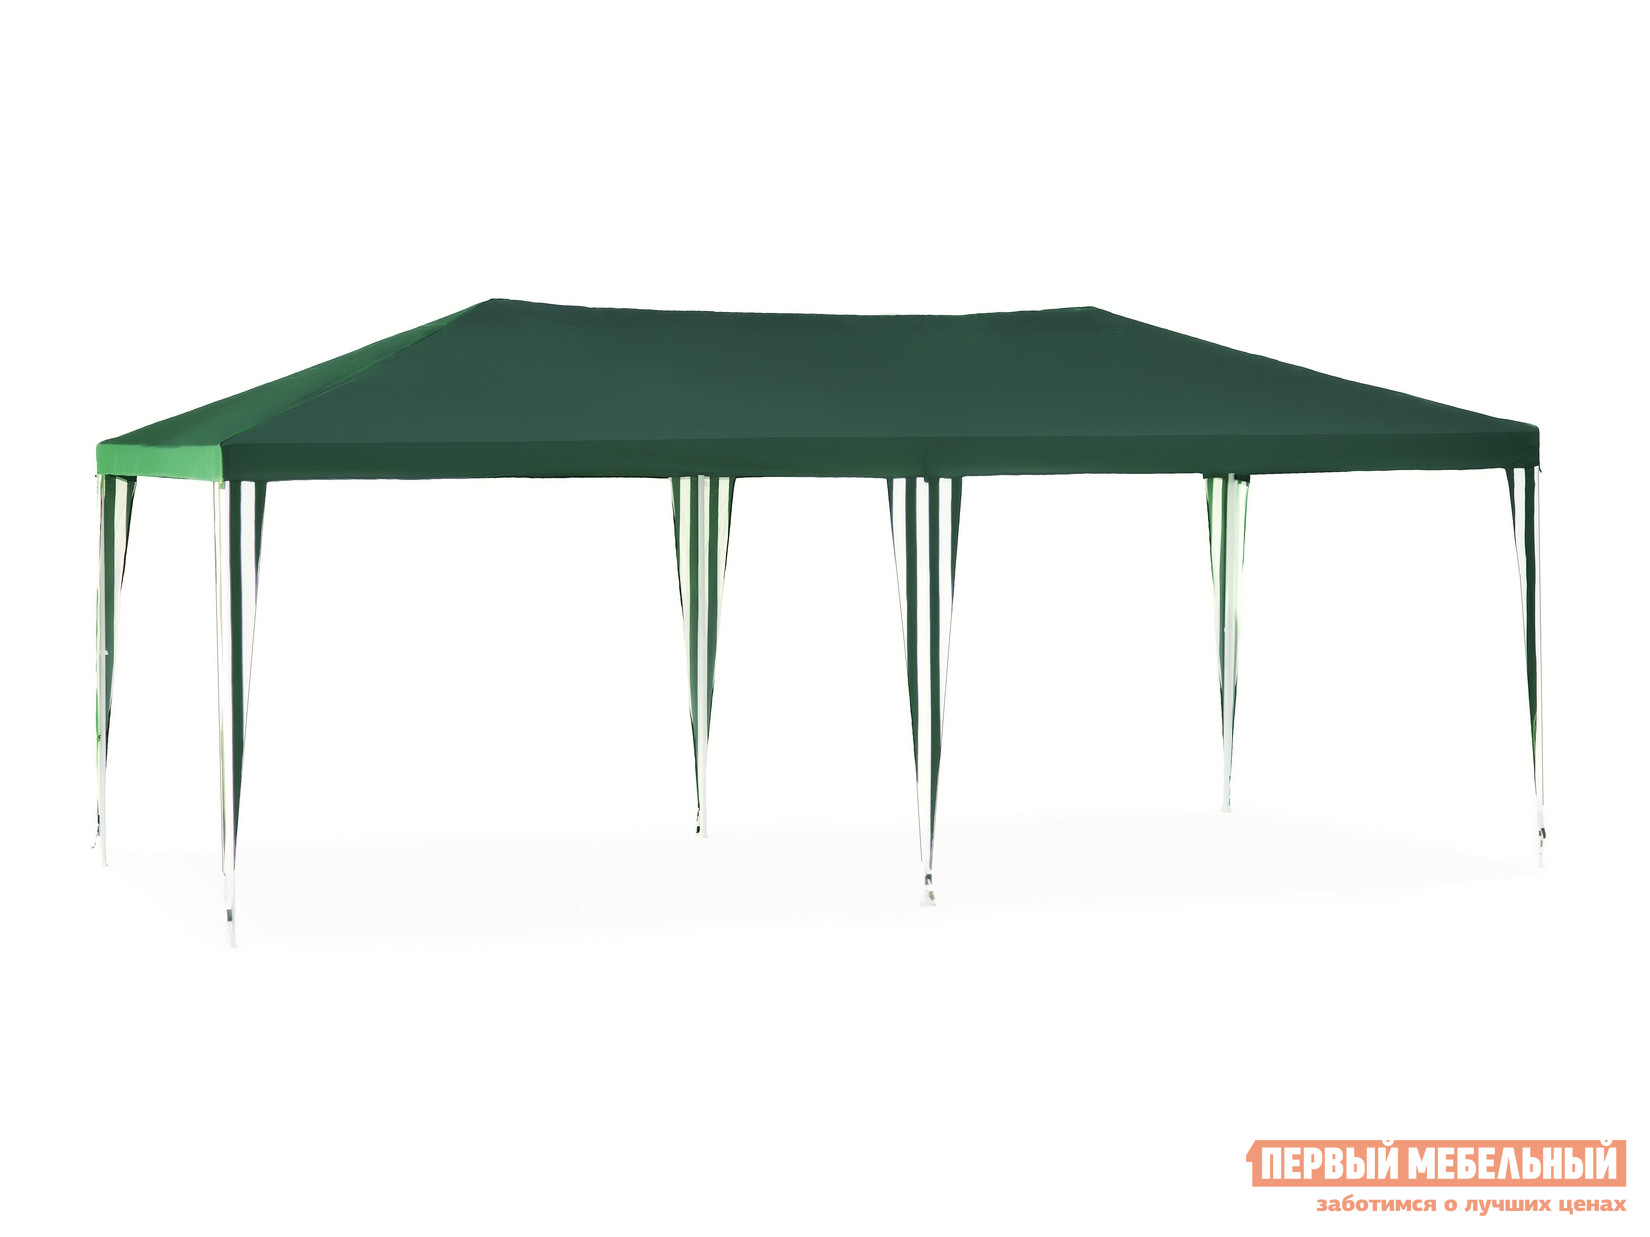 Складной шатер для дачи 6х3 Лекс групп Green Glade 1057 стул складной для сада green glade 54х47х89 см